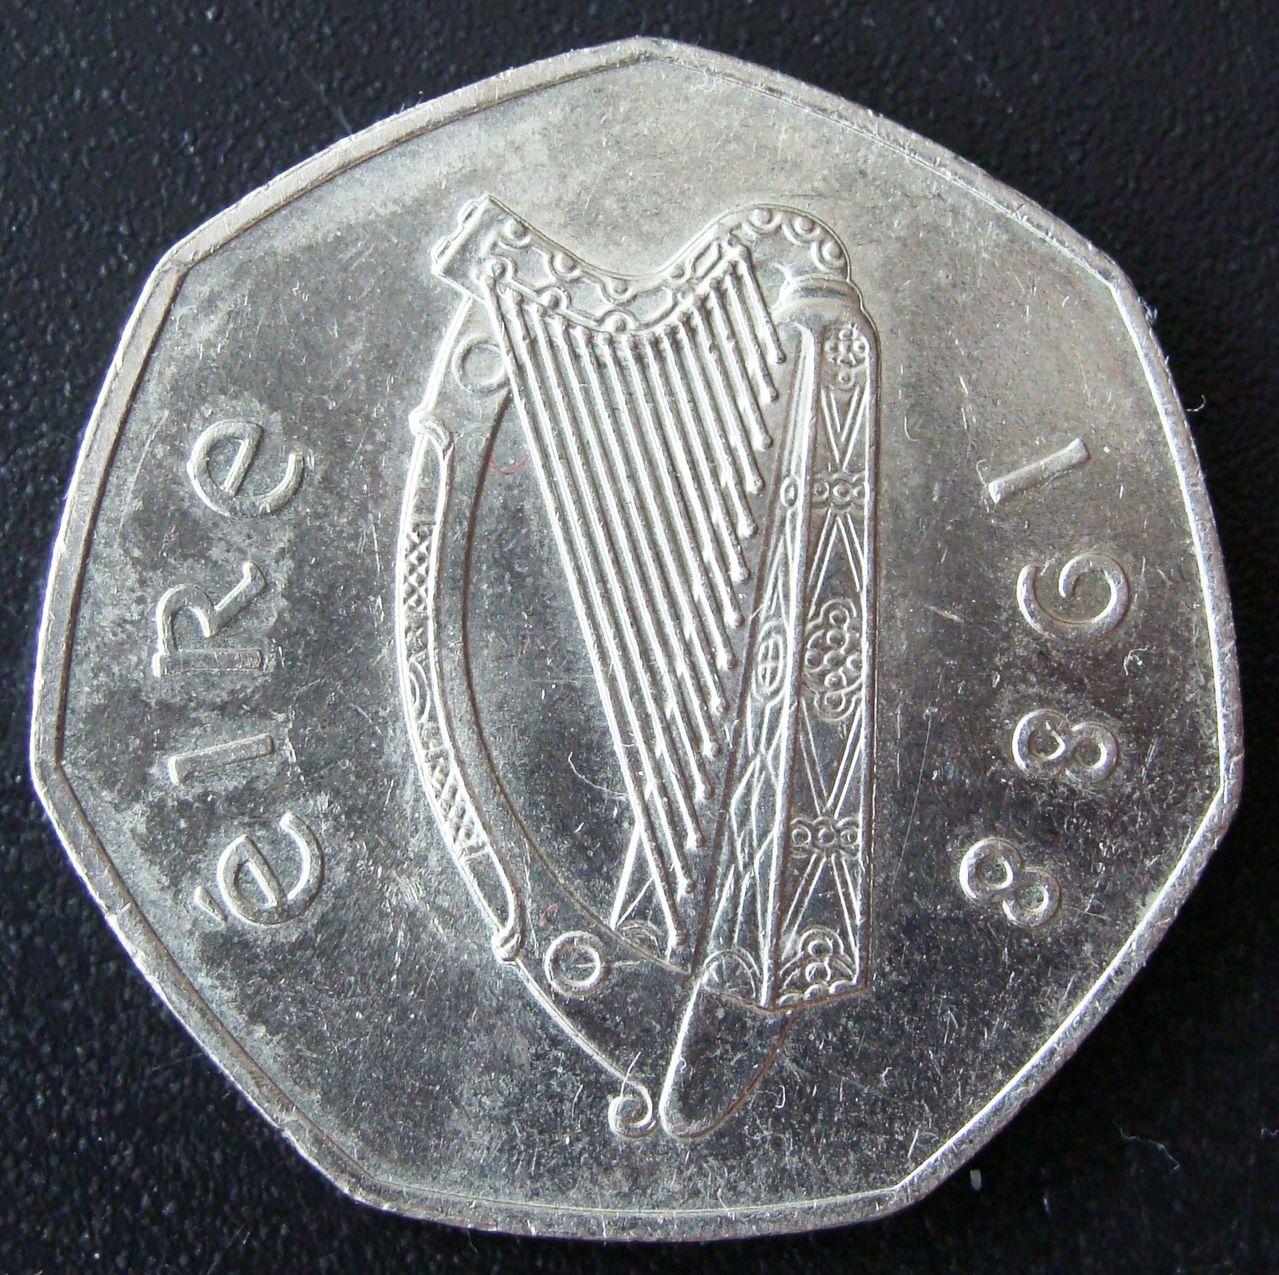 50 Peniques. Irlanda (Milenario de Dublín) IRL_50_Peniques_Milenario_Dubl_n_anv